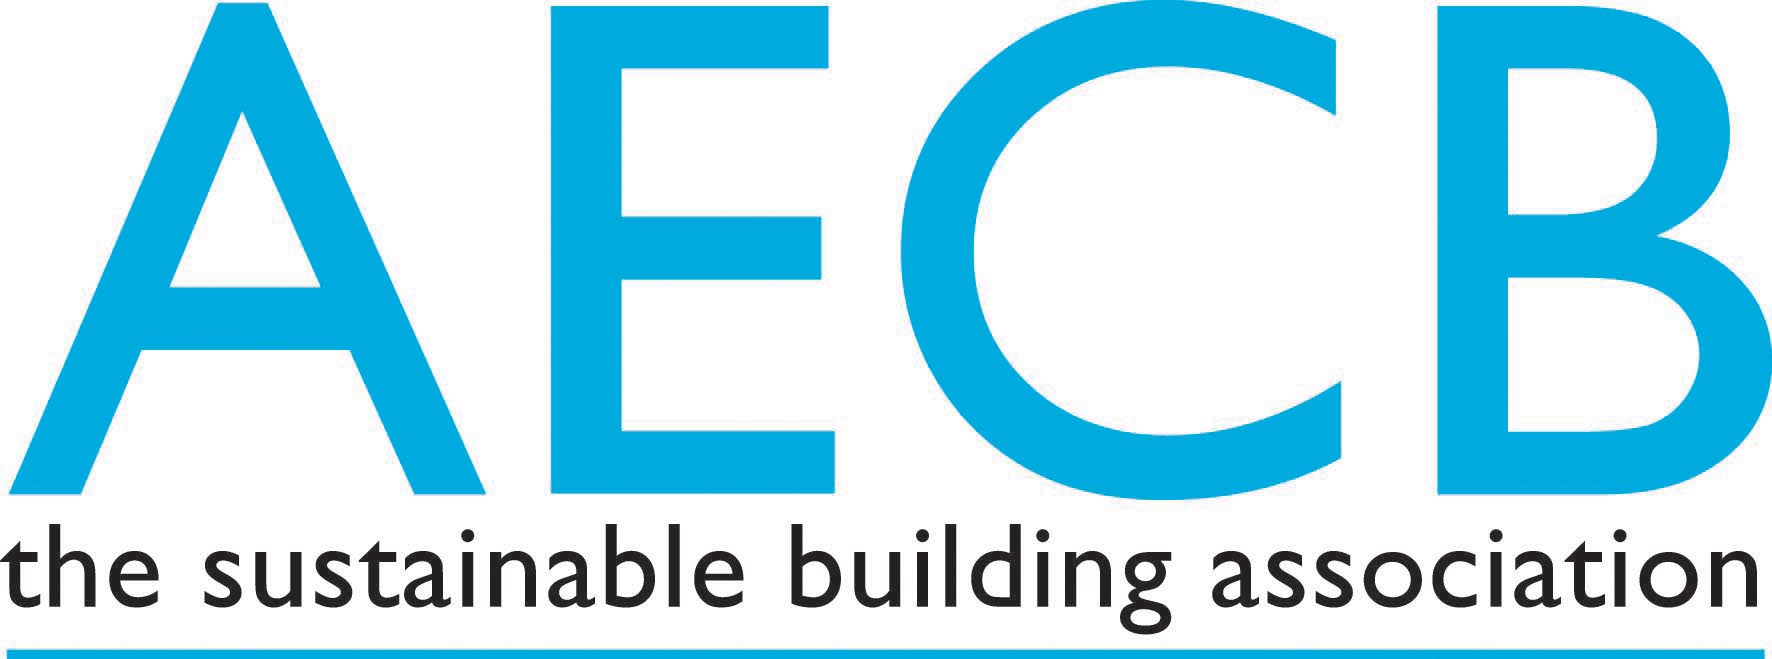 AECB_Logo_HR_RGB